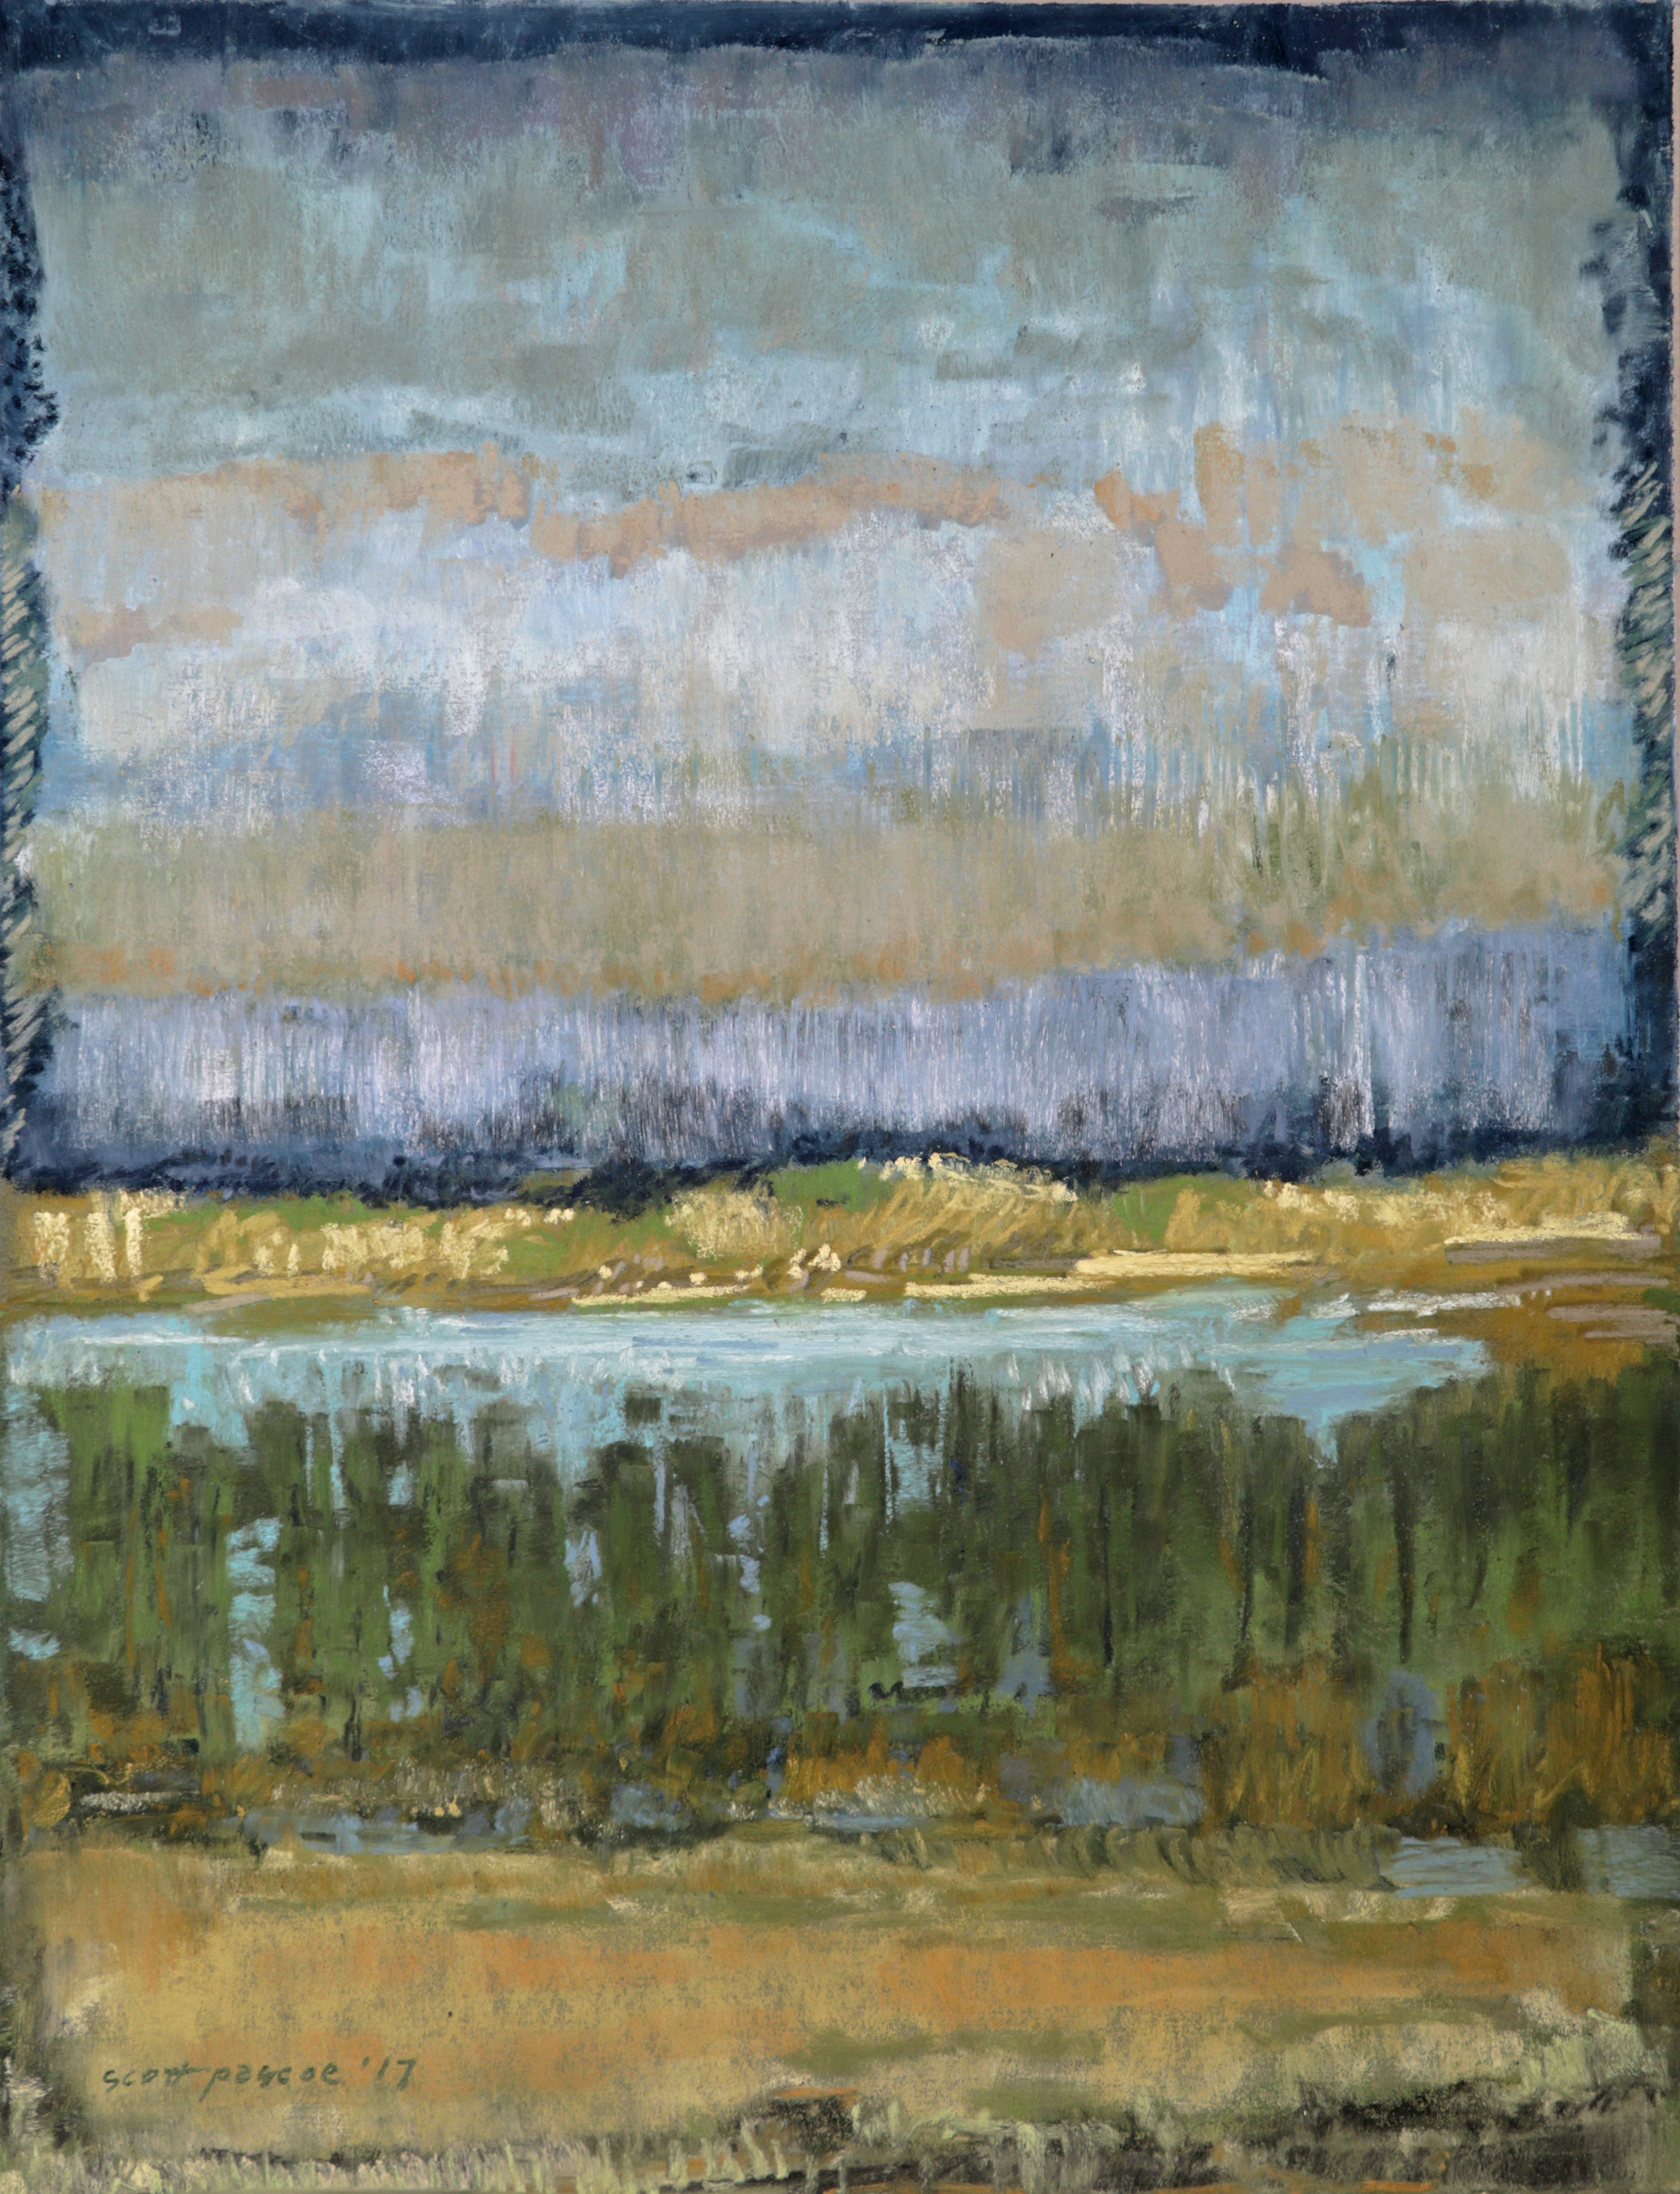 Estuary through Trees 16x12 Soft Pastel - SOLD